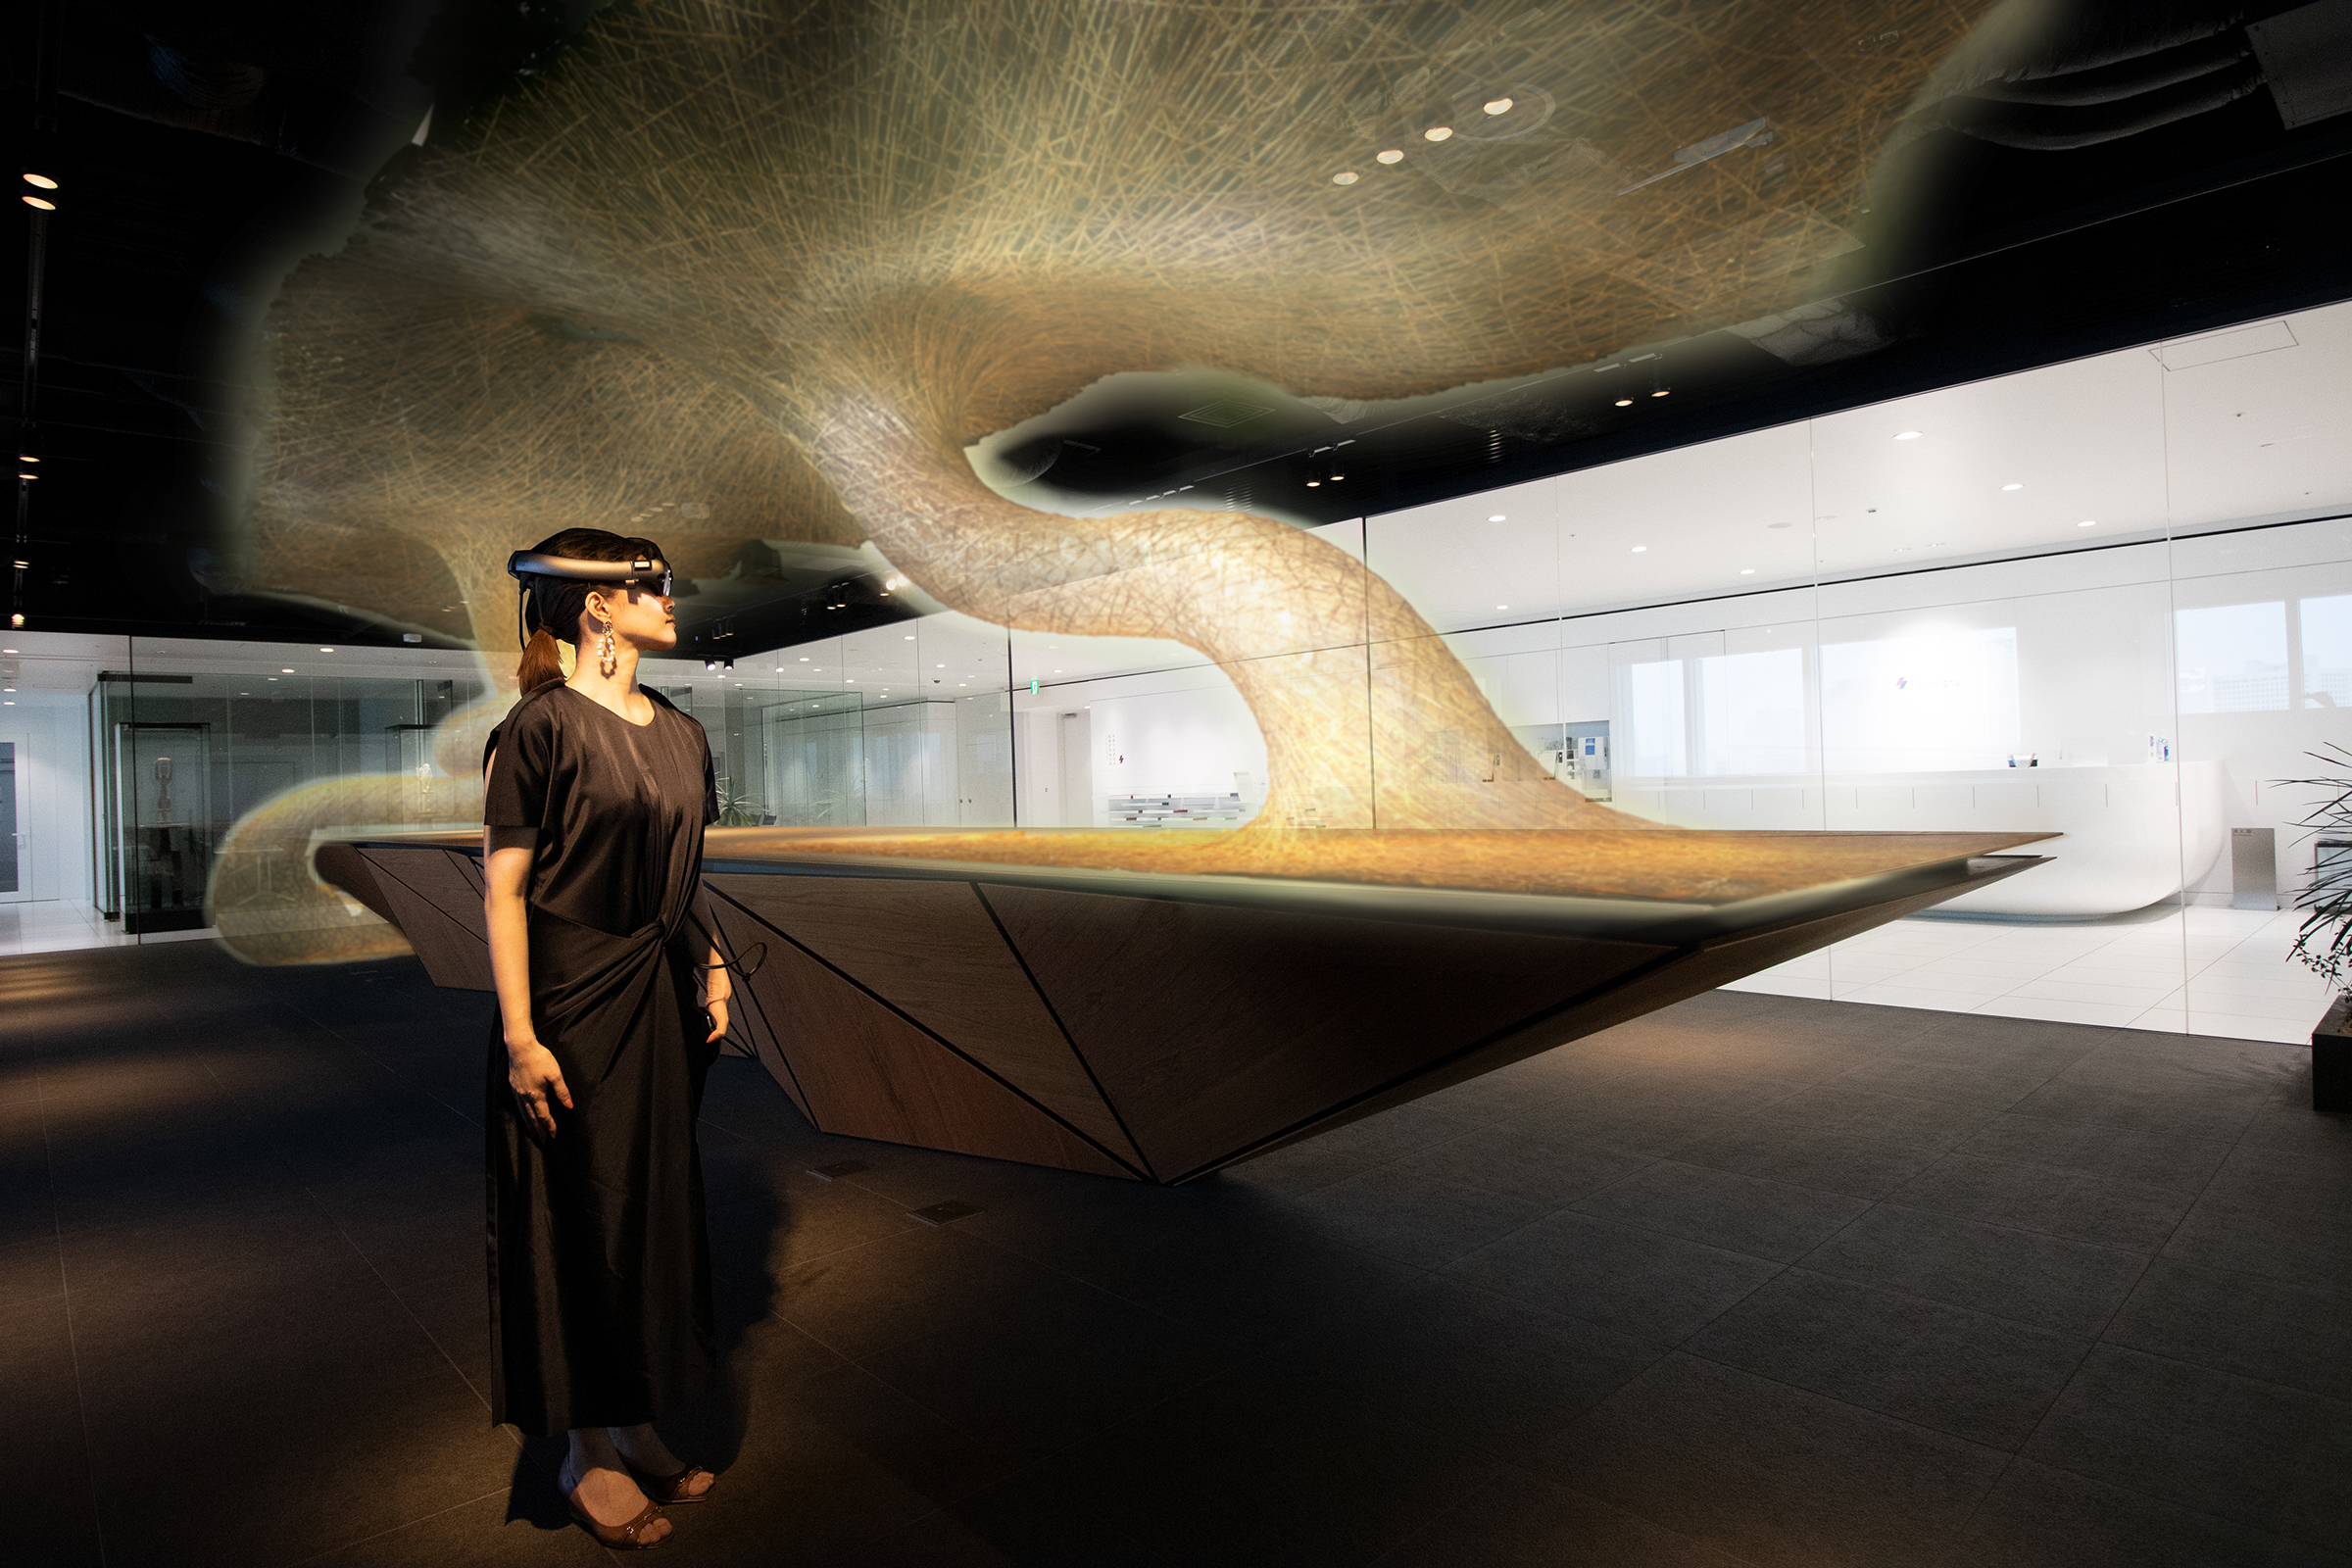 ARとVRを組み合わせたMR技術でいつでも展示作品が鑑賞可能に!丹青社とNTTドコモがコンテンツ開発